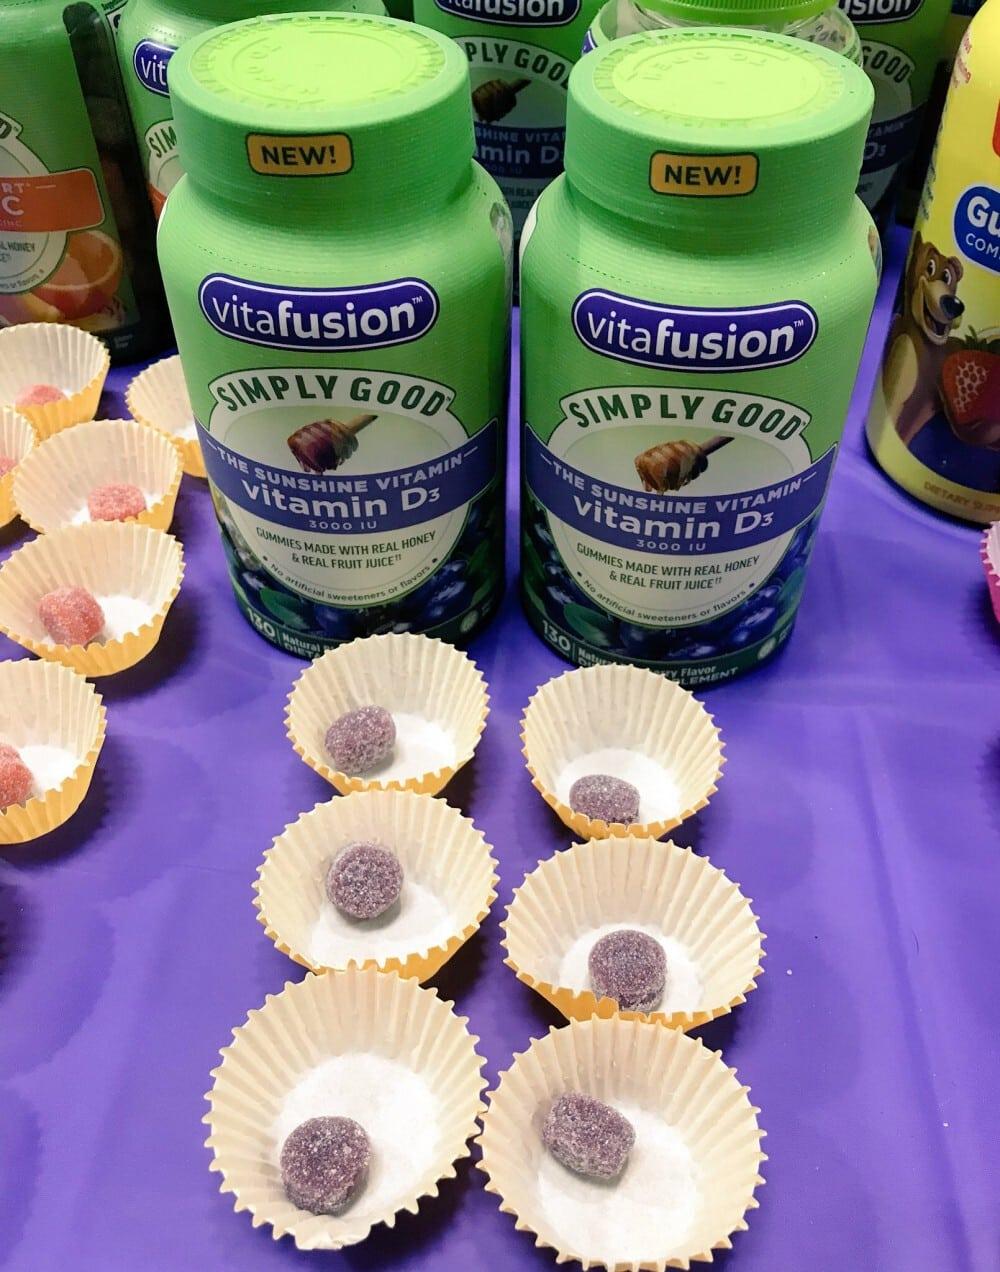 vitafusion simply good